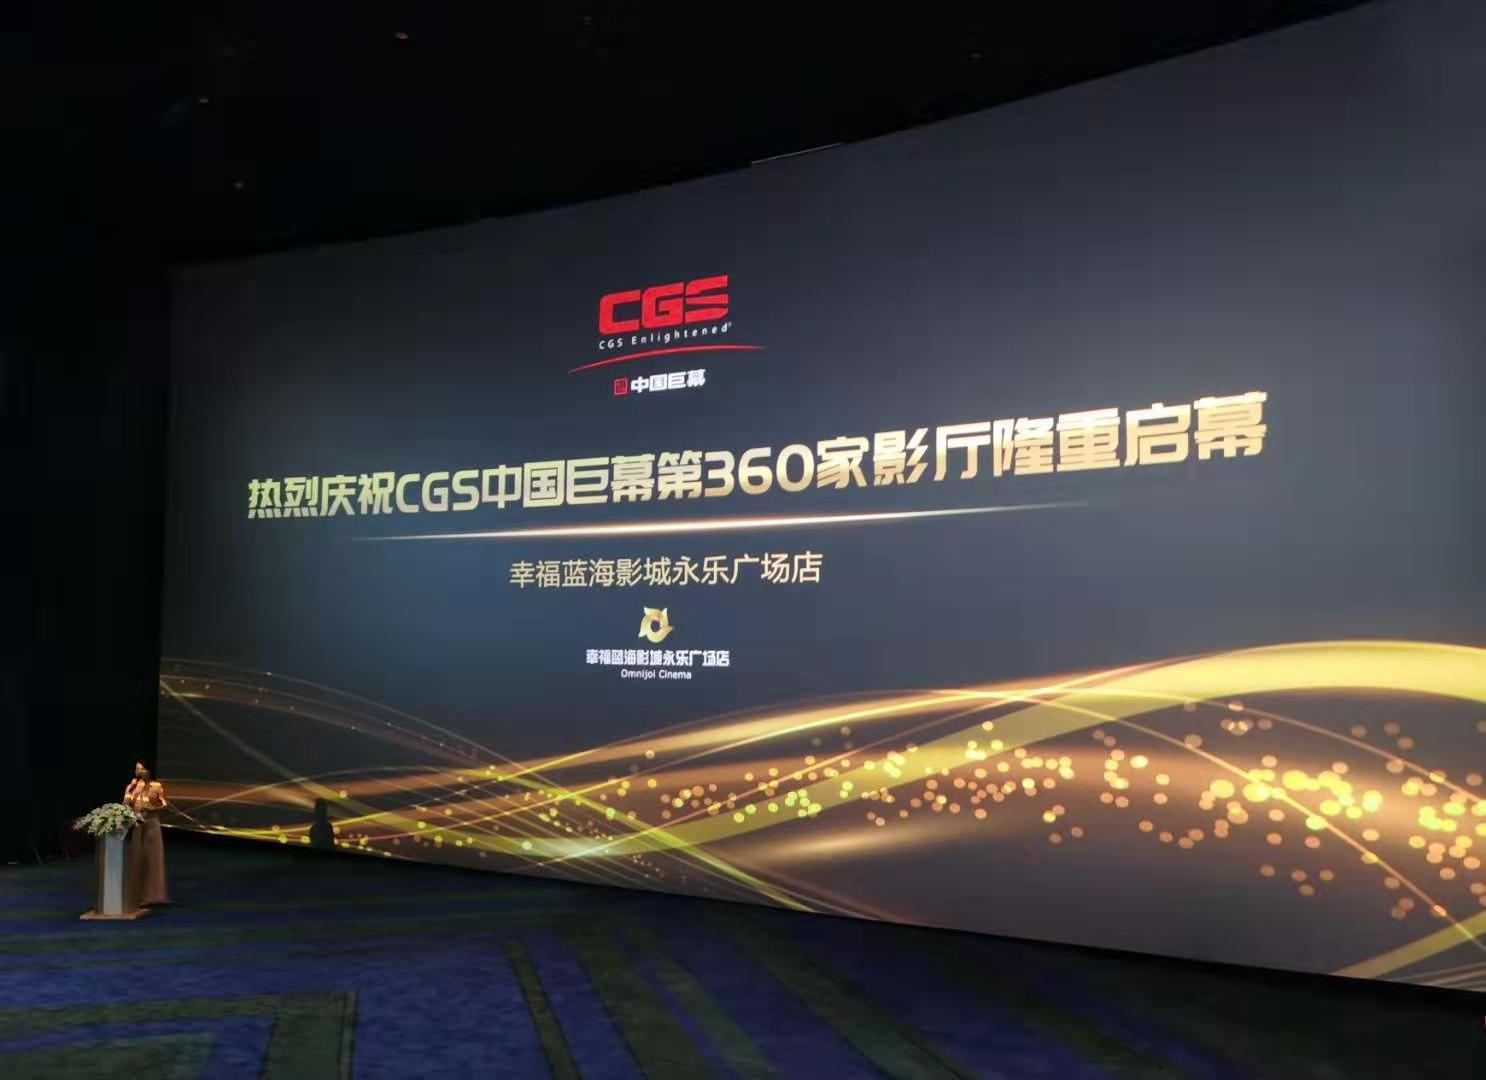 CGS中國巨幕高亮版第360家影廳在上海幸福藍海永樂廣場店隆重啟幕